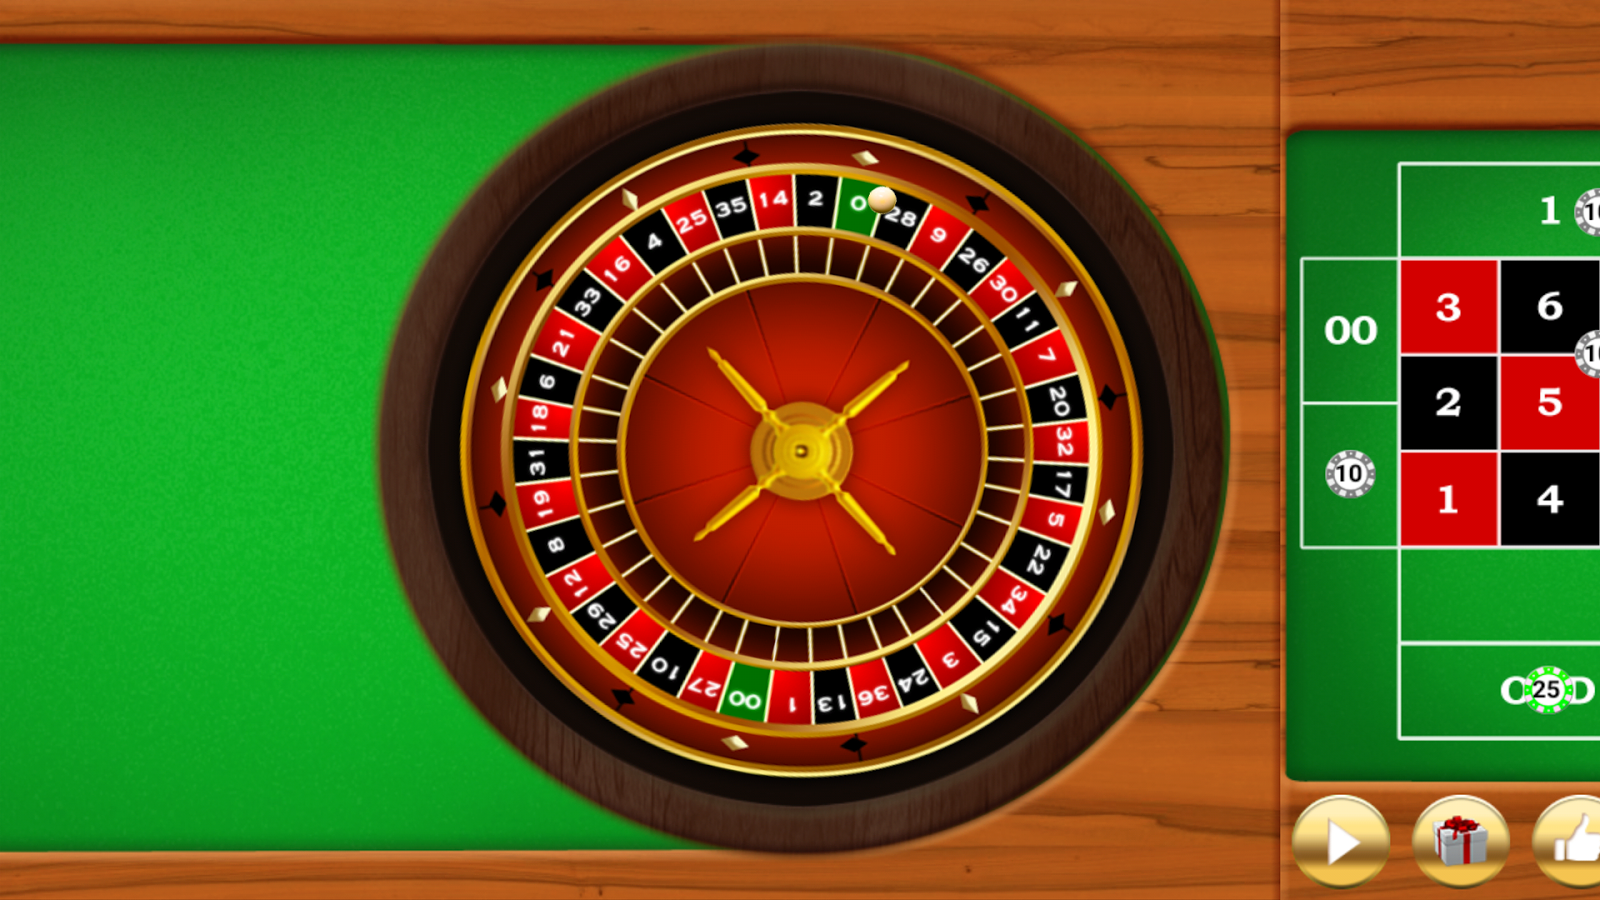 roulettes casino online mobile casino deutsch